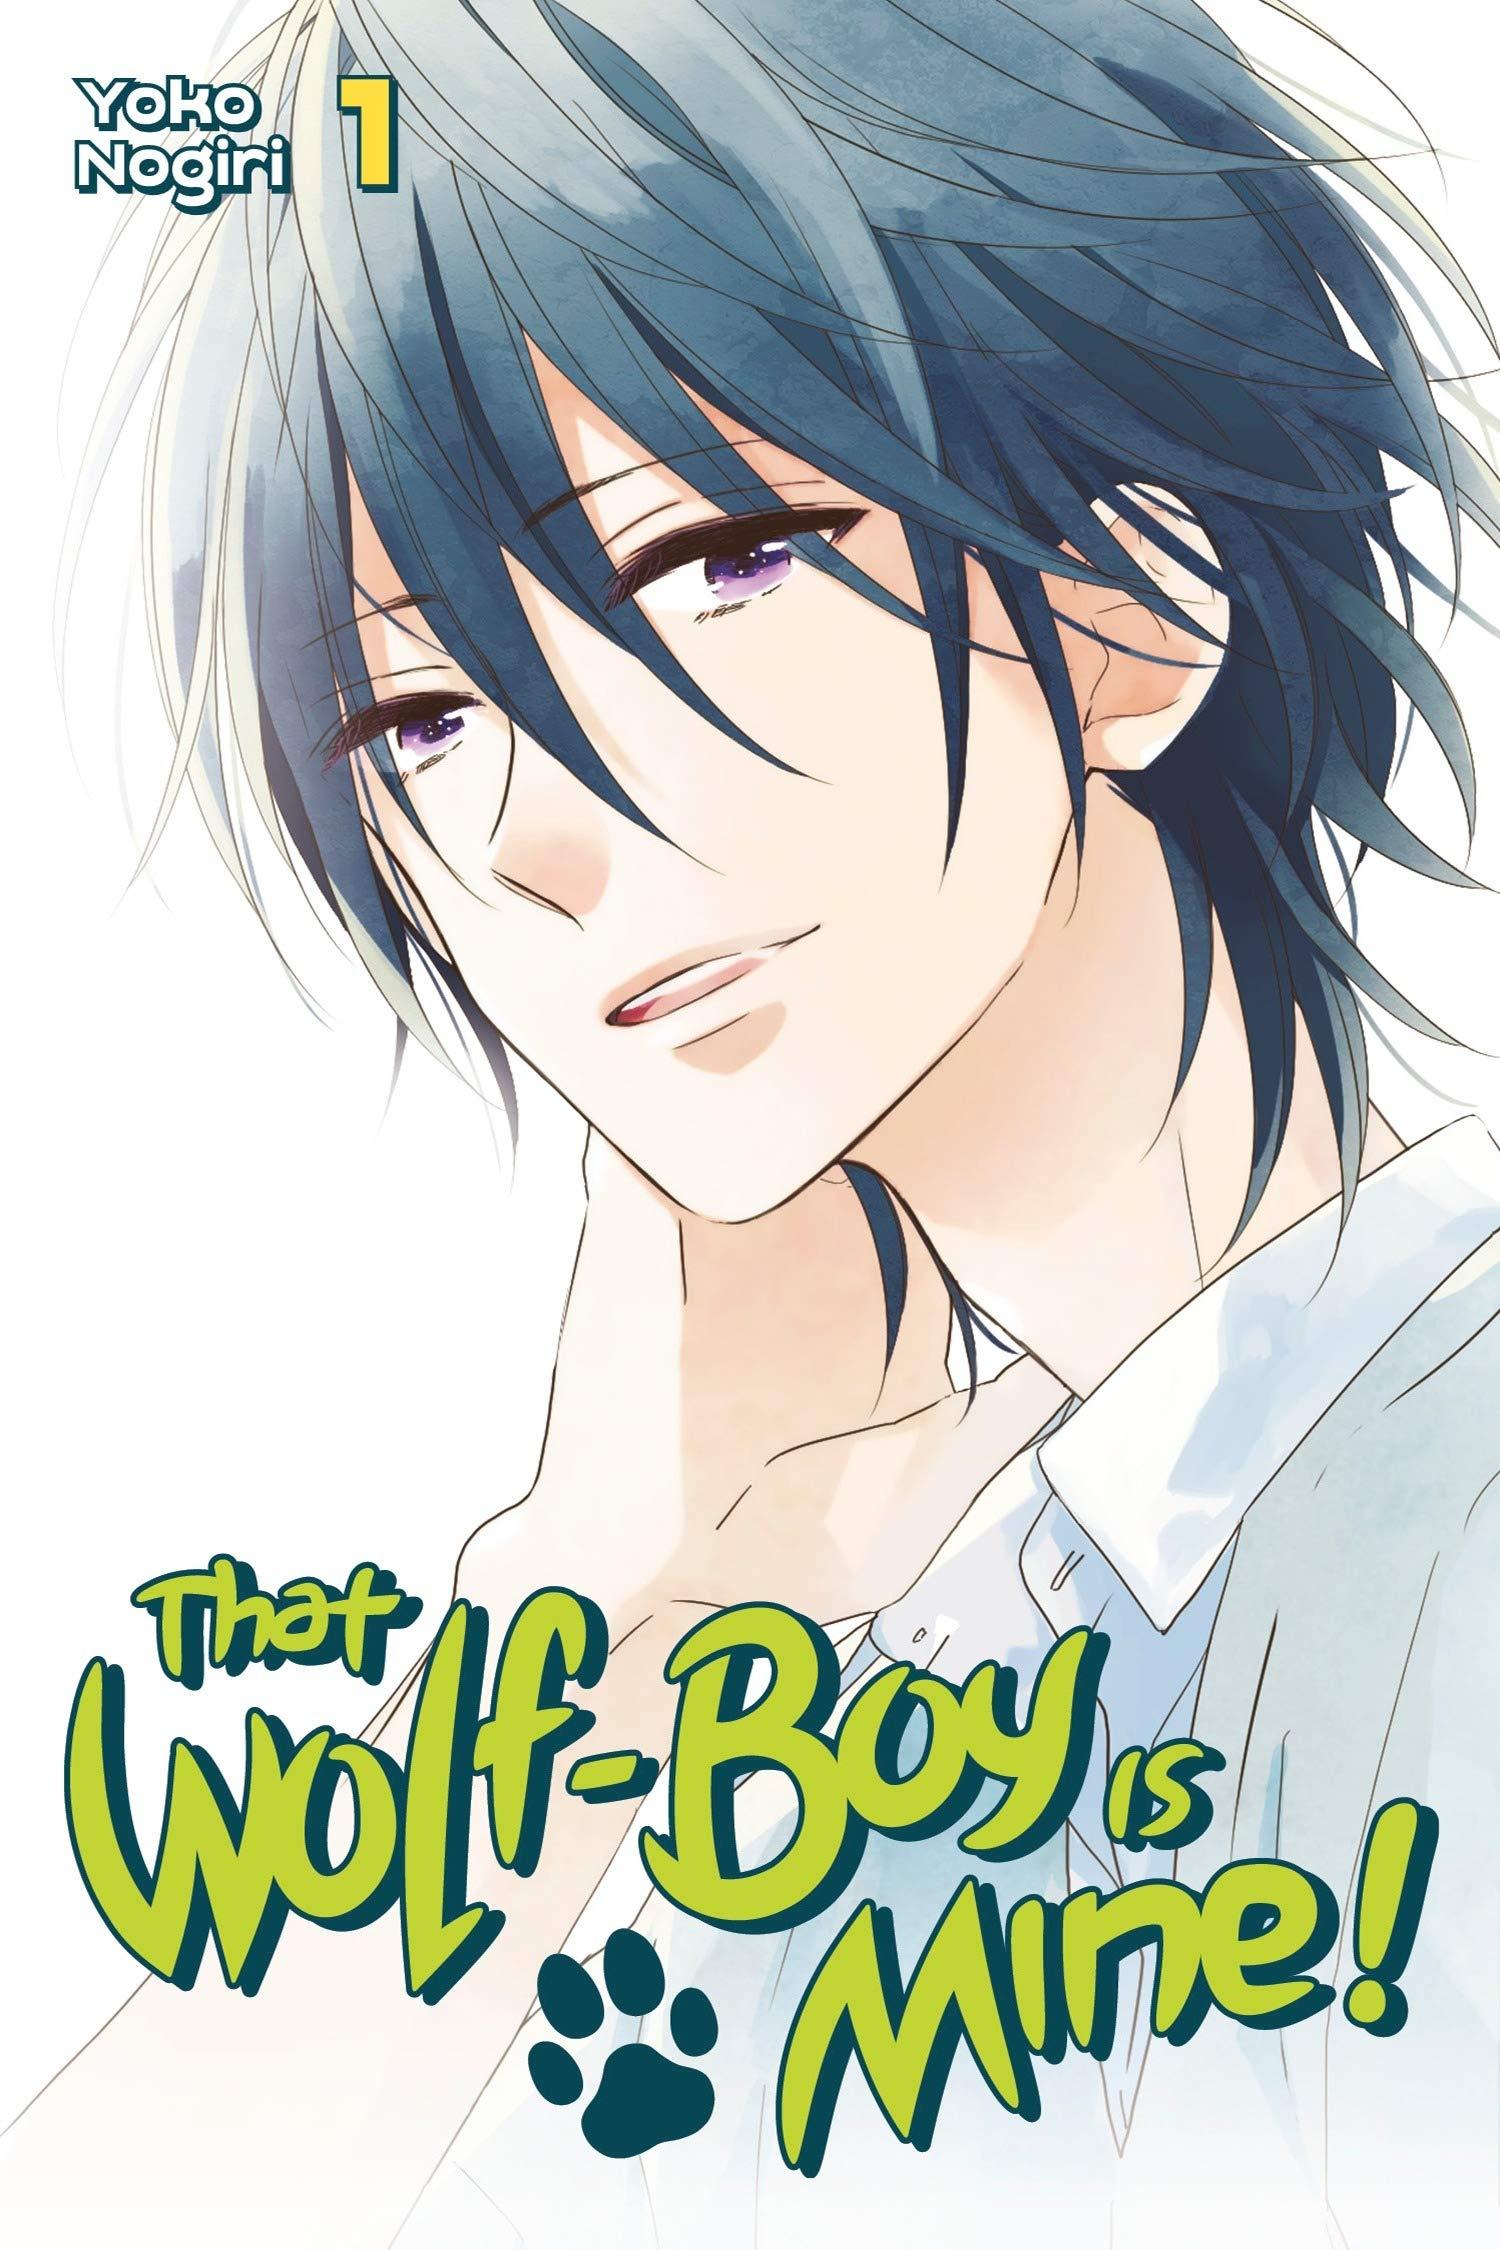 That Wolf Boy Is Mine 1 Nogiri Yoko 9781632363732 Books Amazon Ca